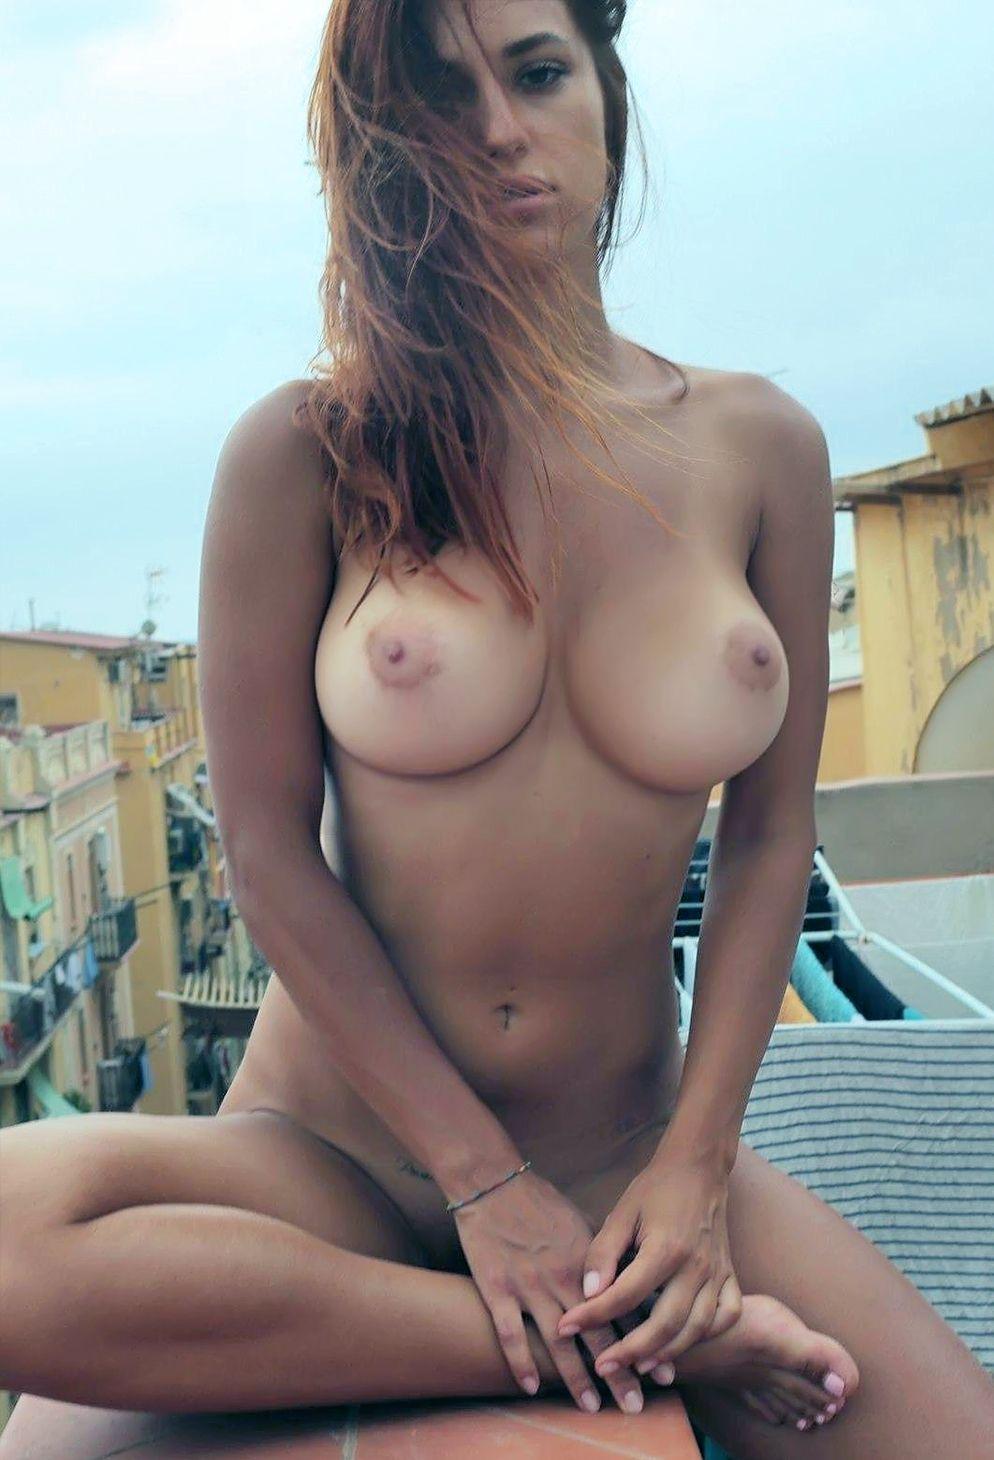 Hot nude male gif